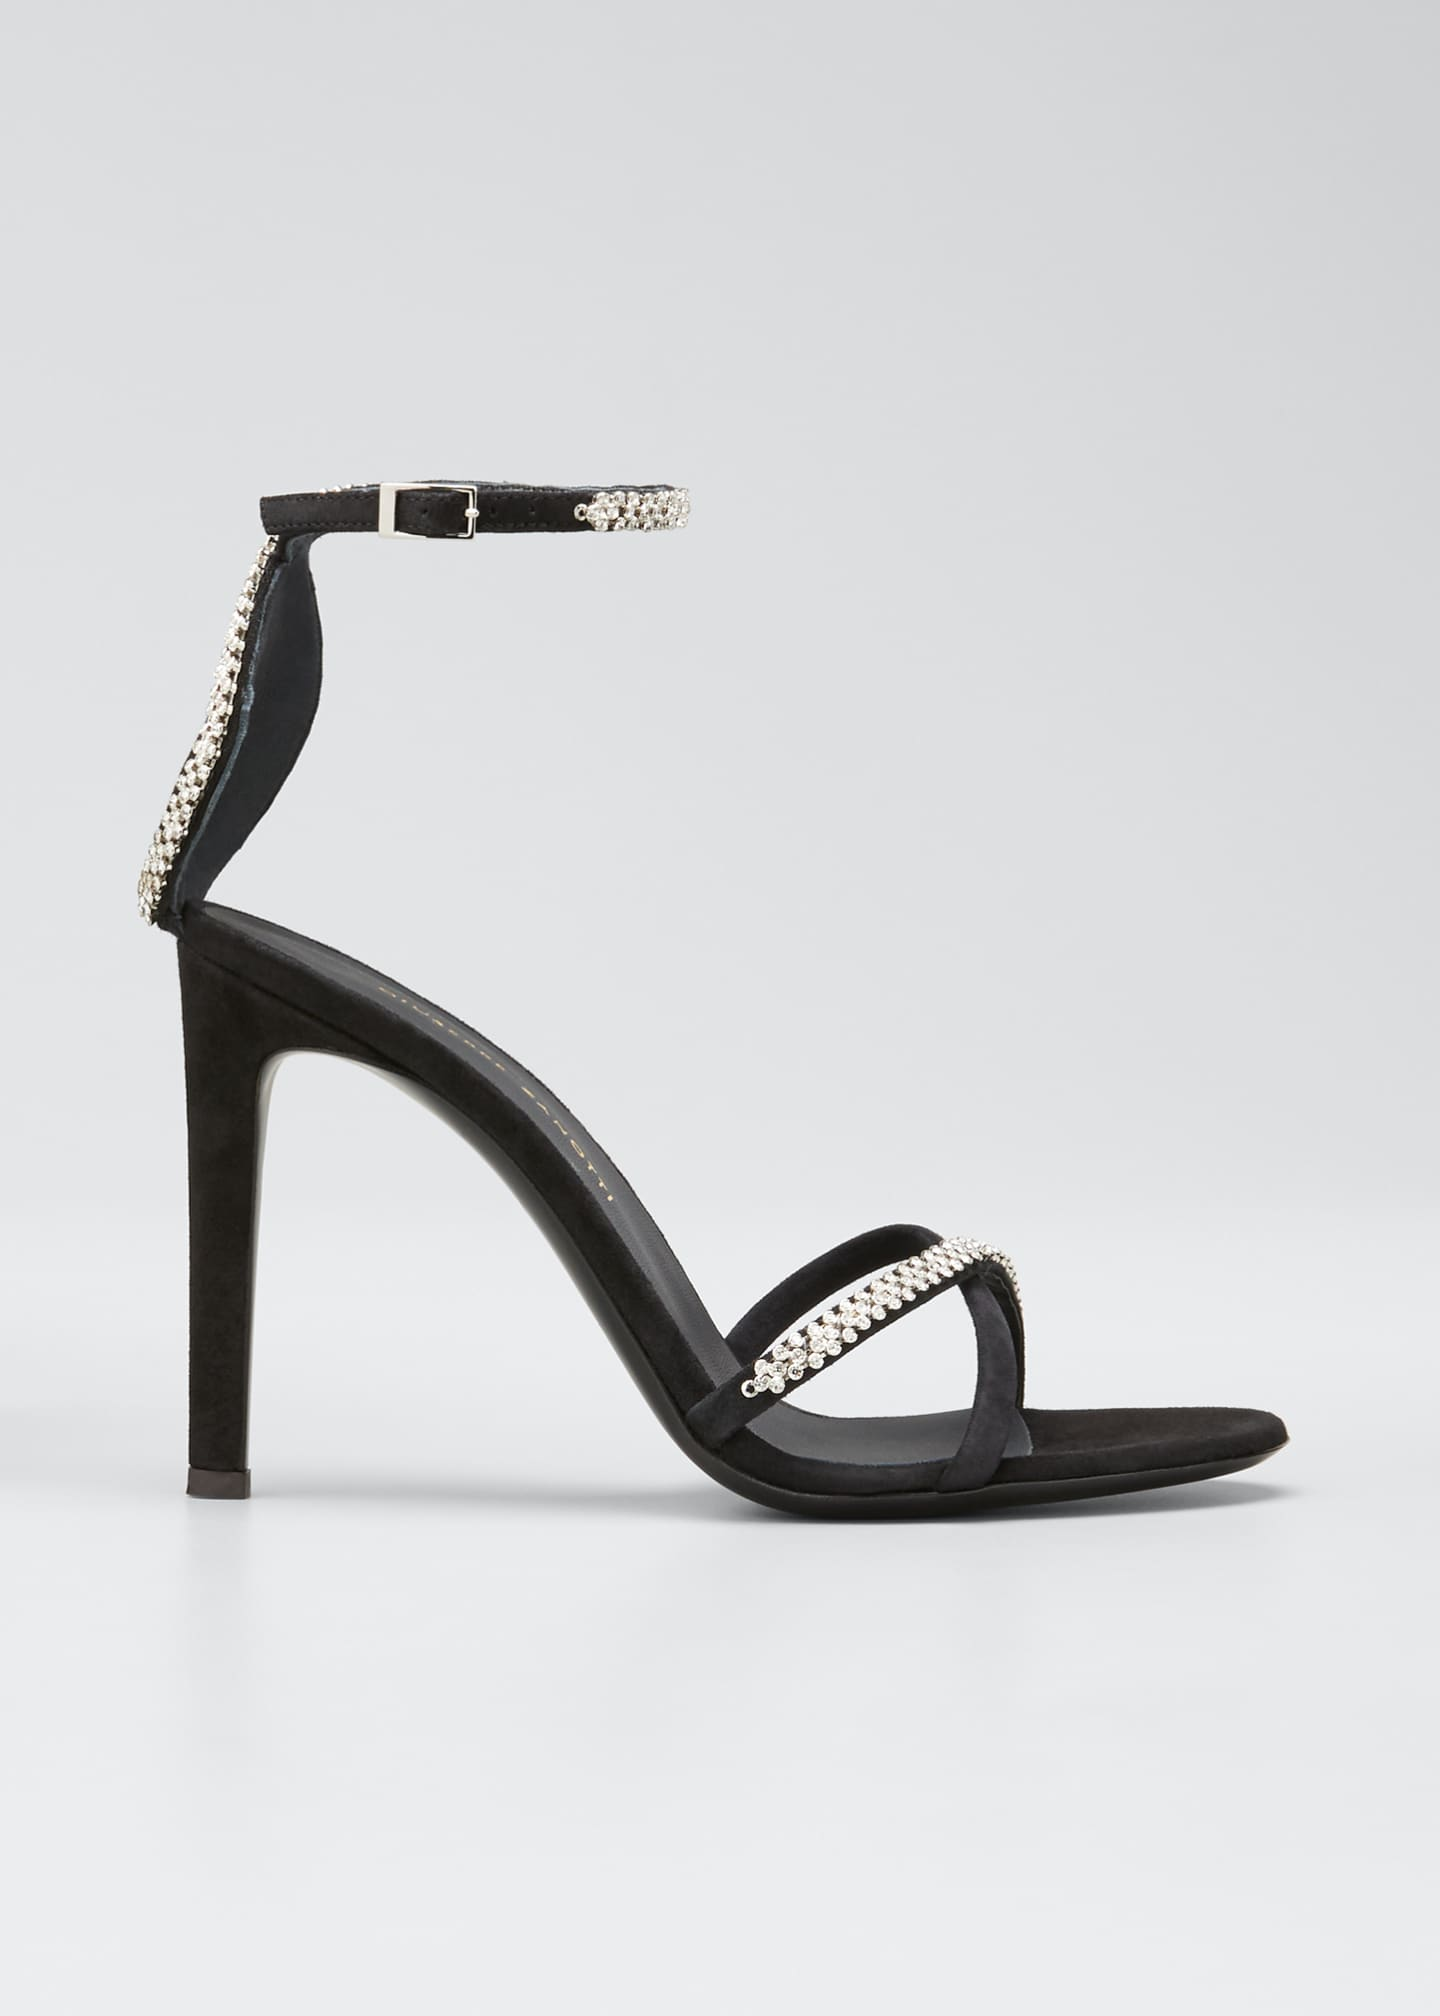 Giuseppe Zanotti Ricoperto Crystal Suede Strappy Sandals